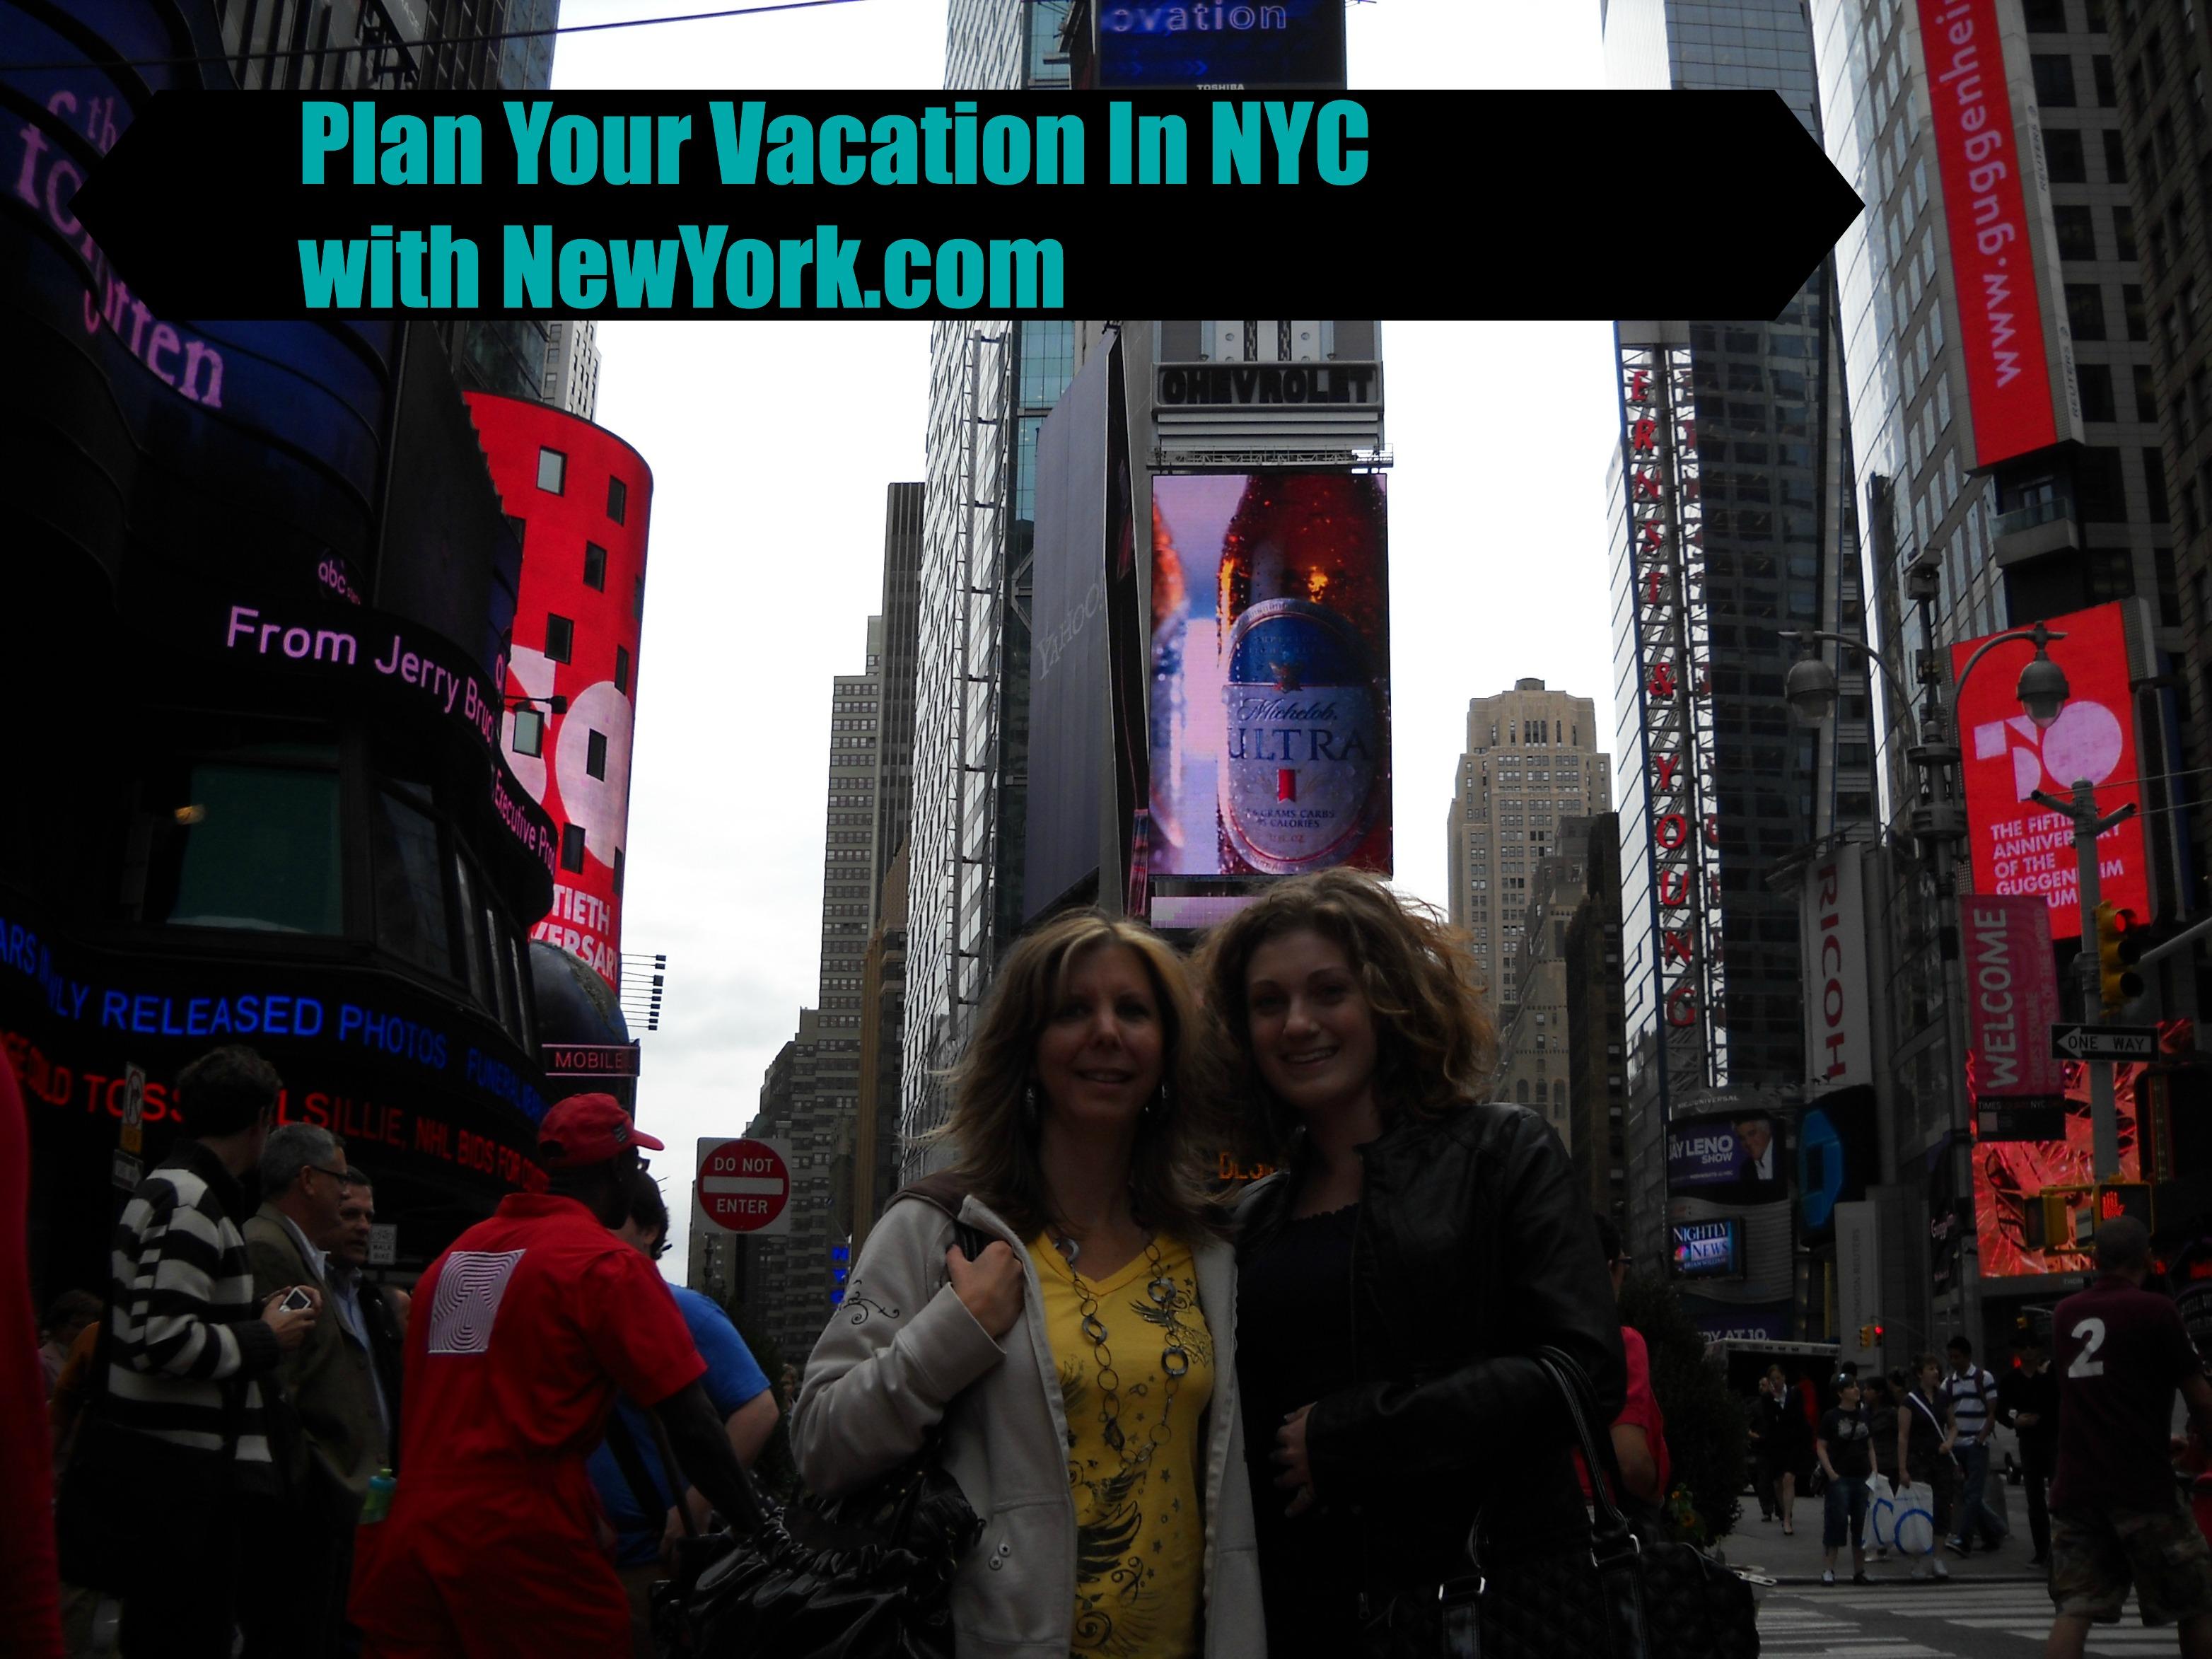 Visiting New York City- NewYork.com #WeLoveThisCity